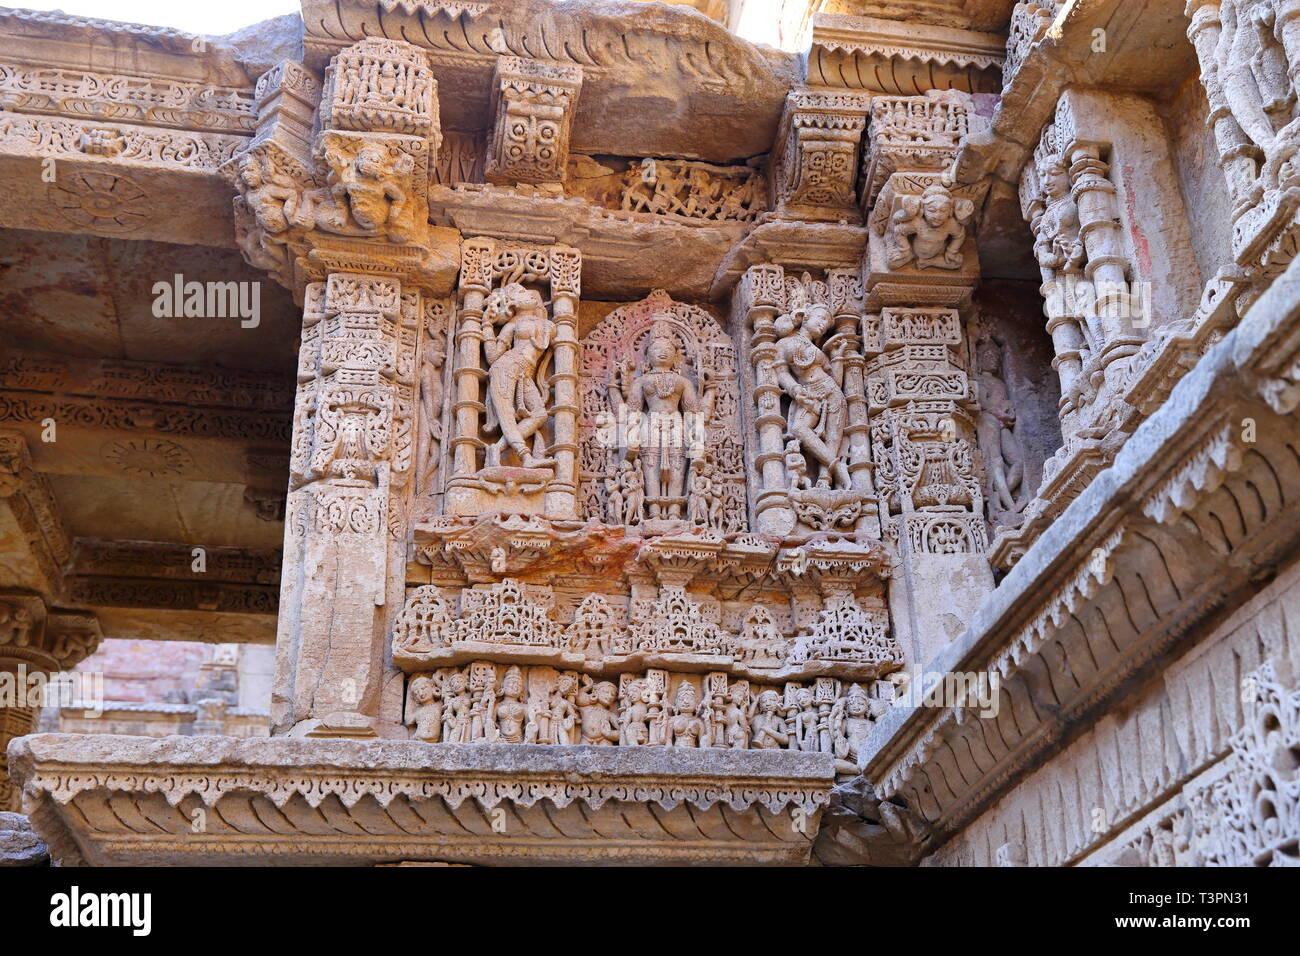 Rani ki vav, an stepwell on the banks of Saraswati River in Patan. A UNESCO world heritage site in Gujarat, India - Stock Image